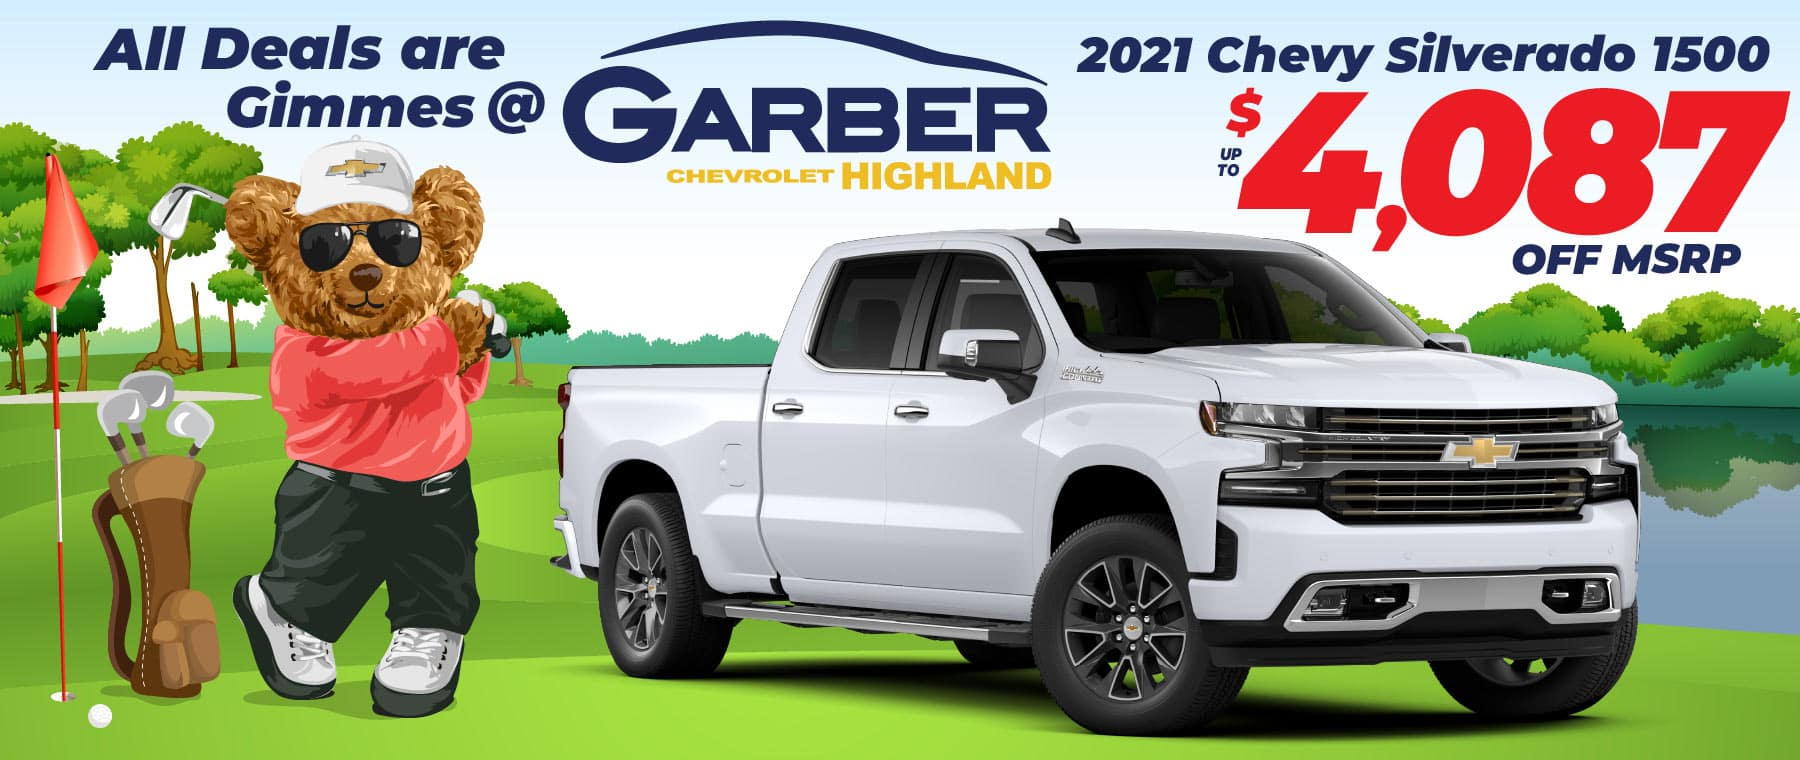 2021 Chevy Silverado - up to $4087 off MSRP